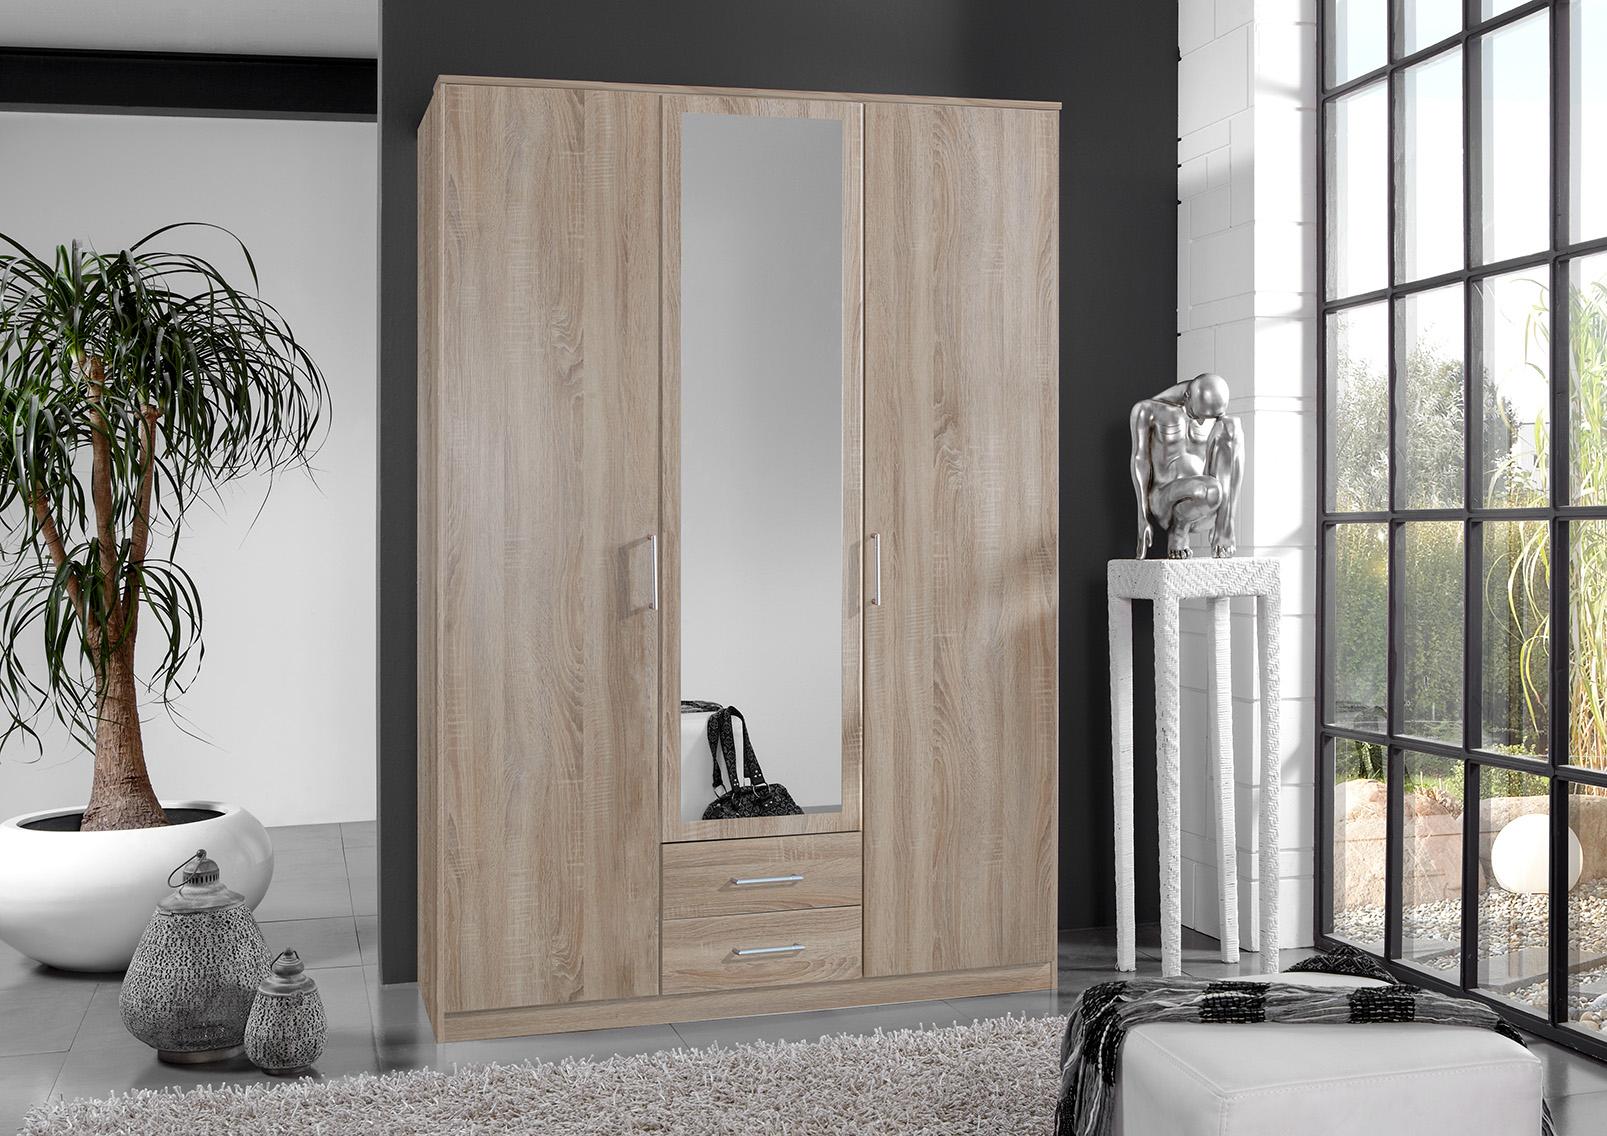 Armoire contemporaine 3 portes/2 tiroirs coloris chêne Carola